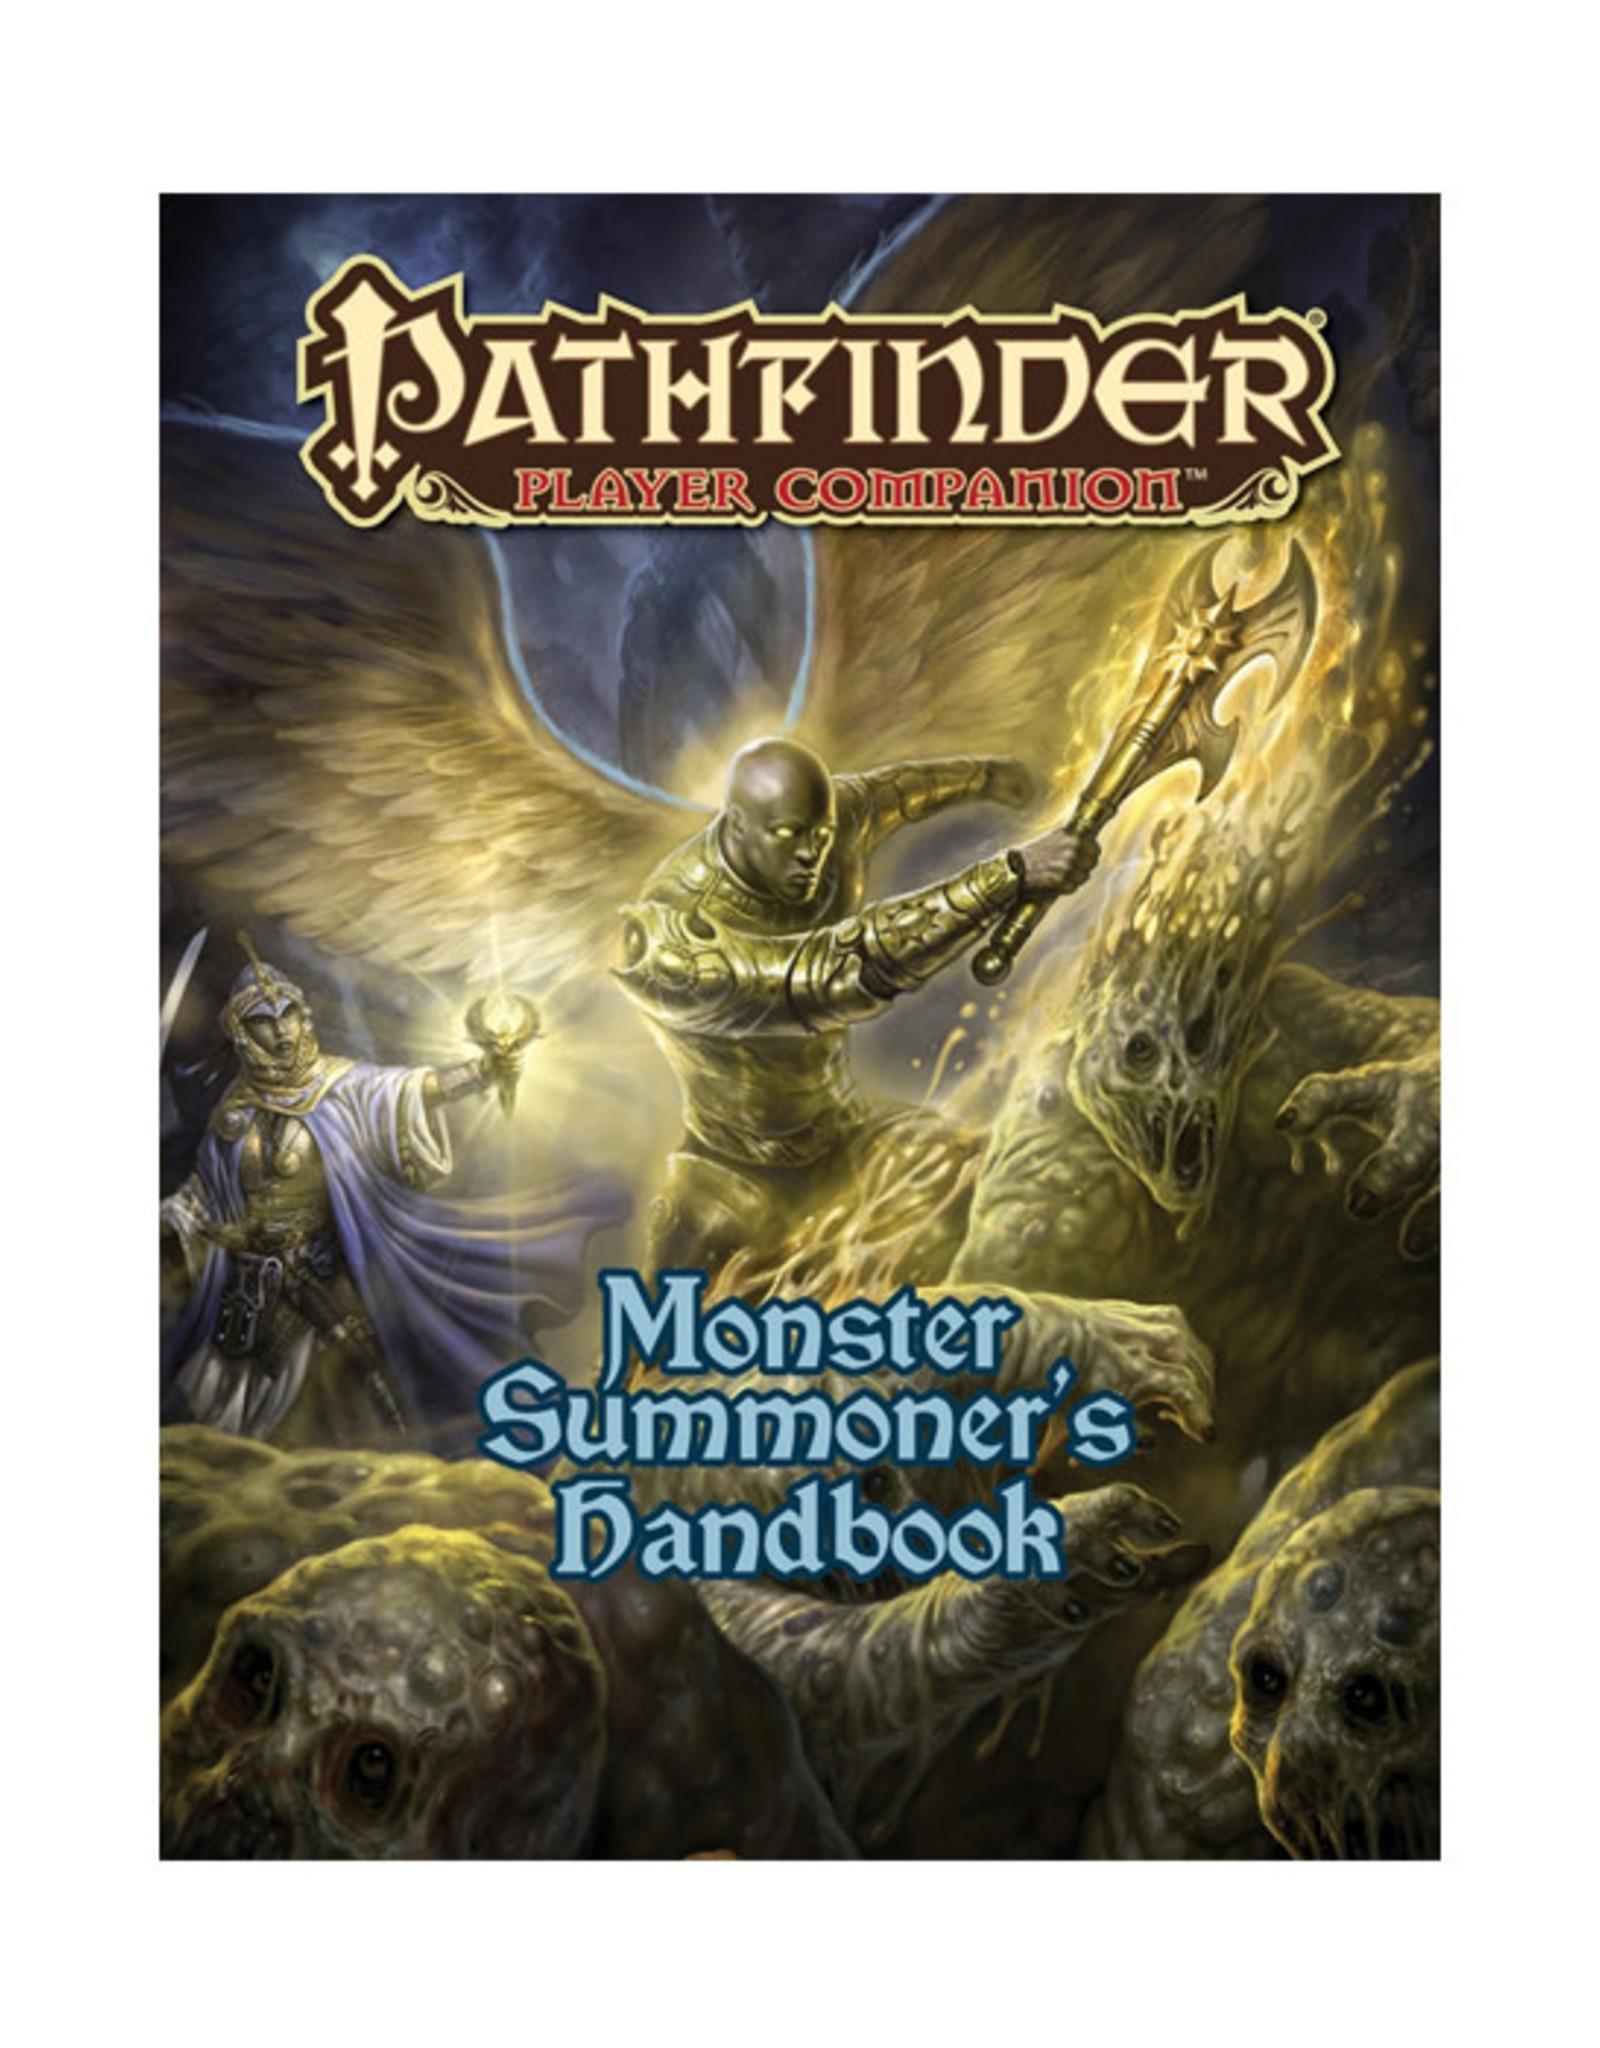 Pathfinder Pathfinder: Player Companion - Monster Summoner's Handbook